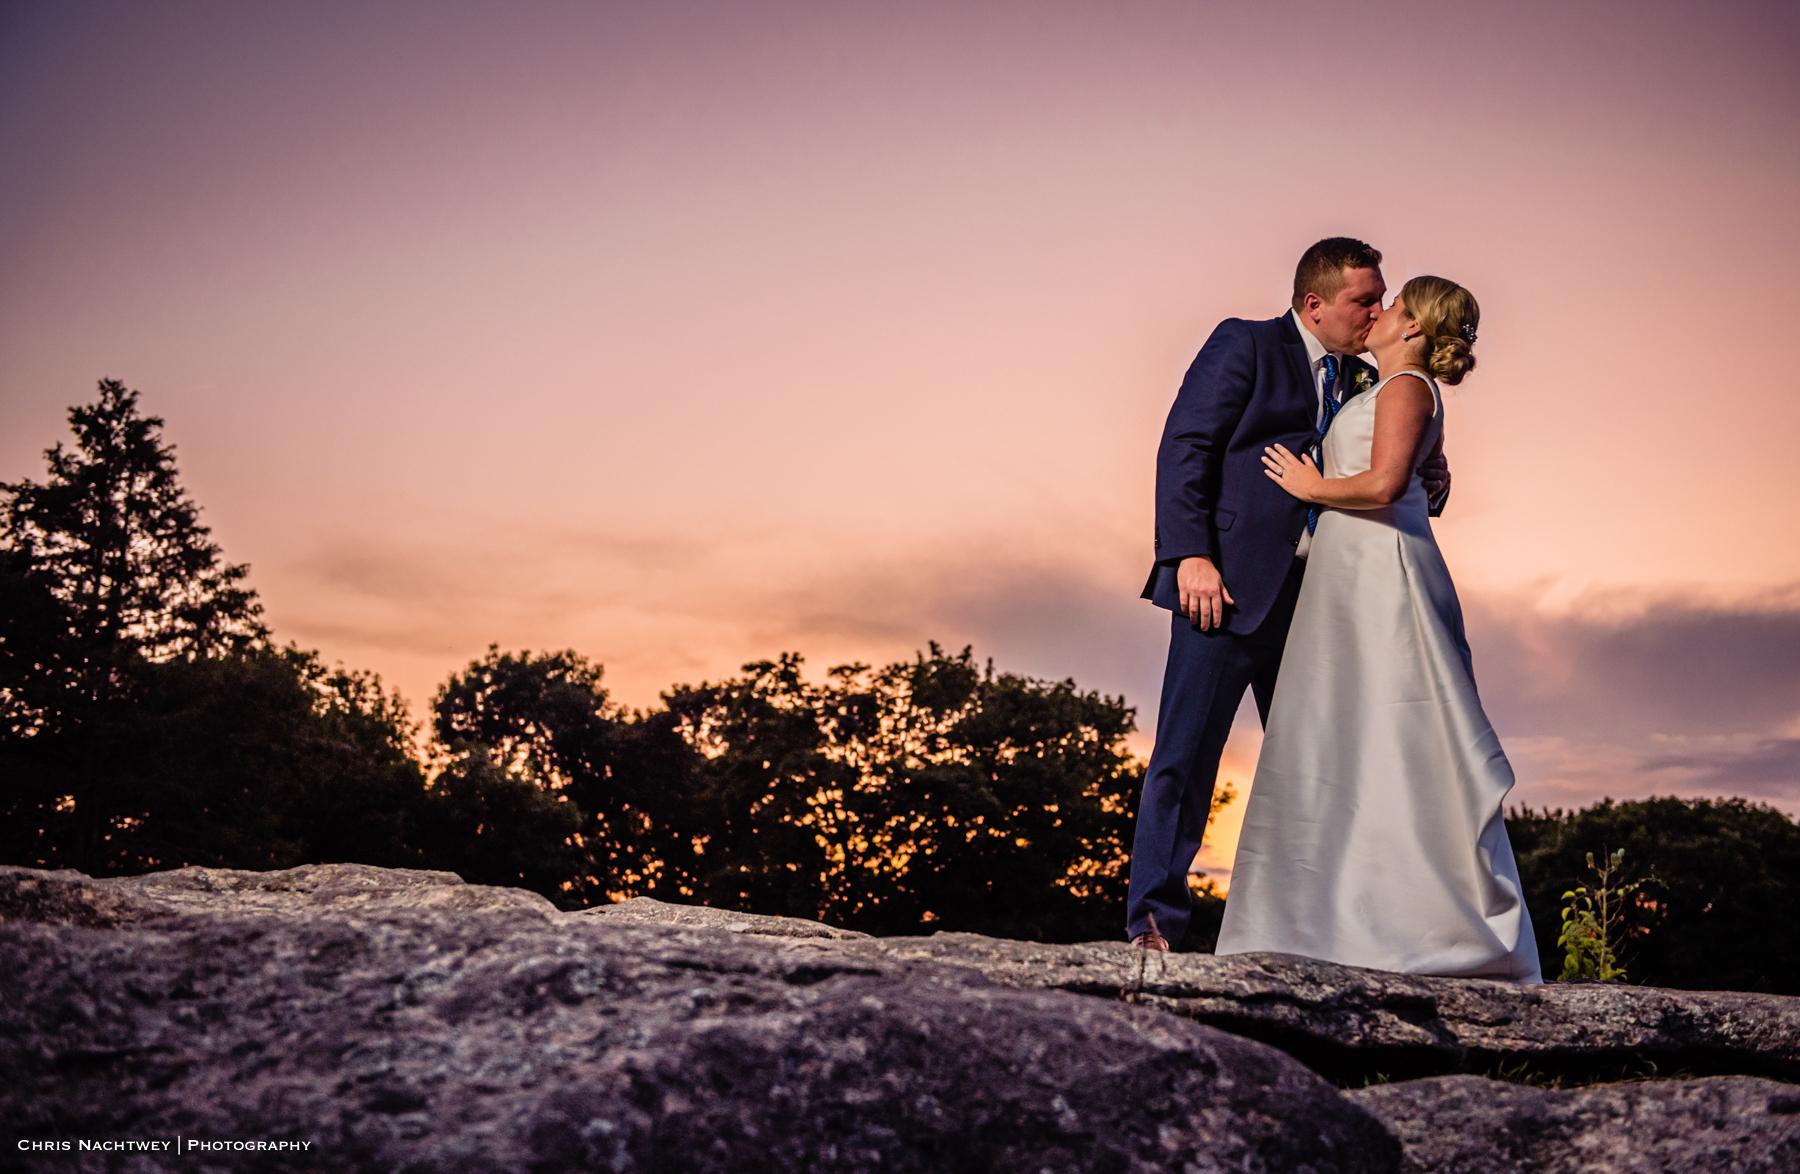 photos-wedding-haley-mansion-mystic-ct-chris-nachtwey-photography-2019-48.jpg